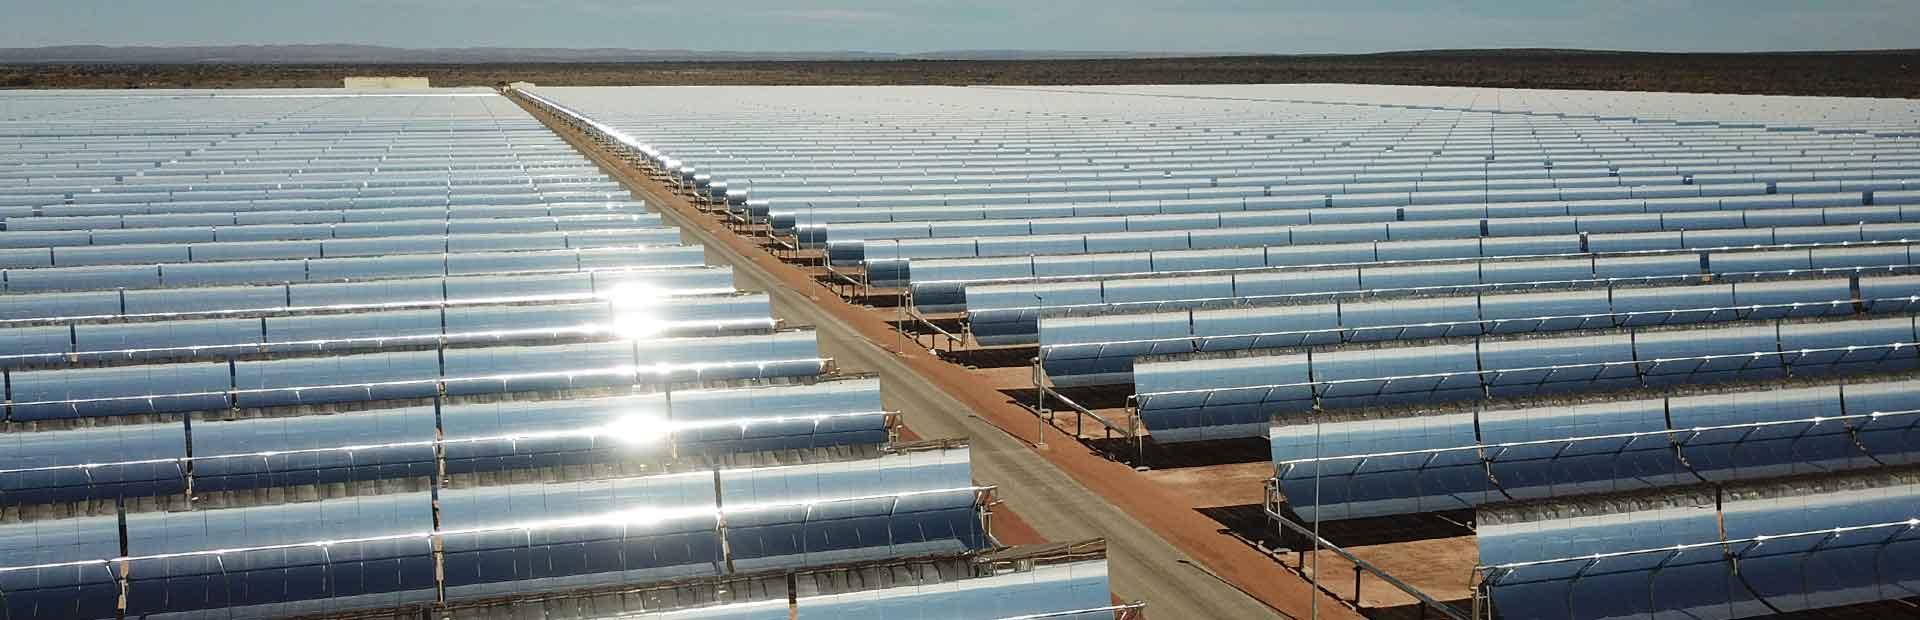 Kathu, beyond clean energy